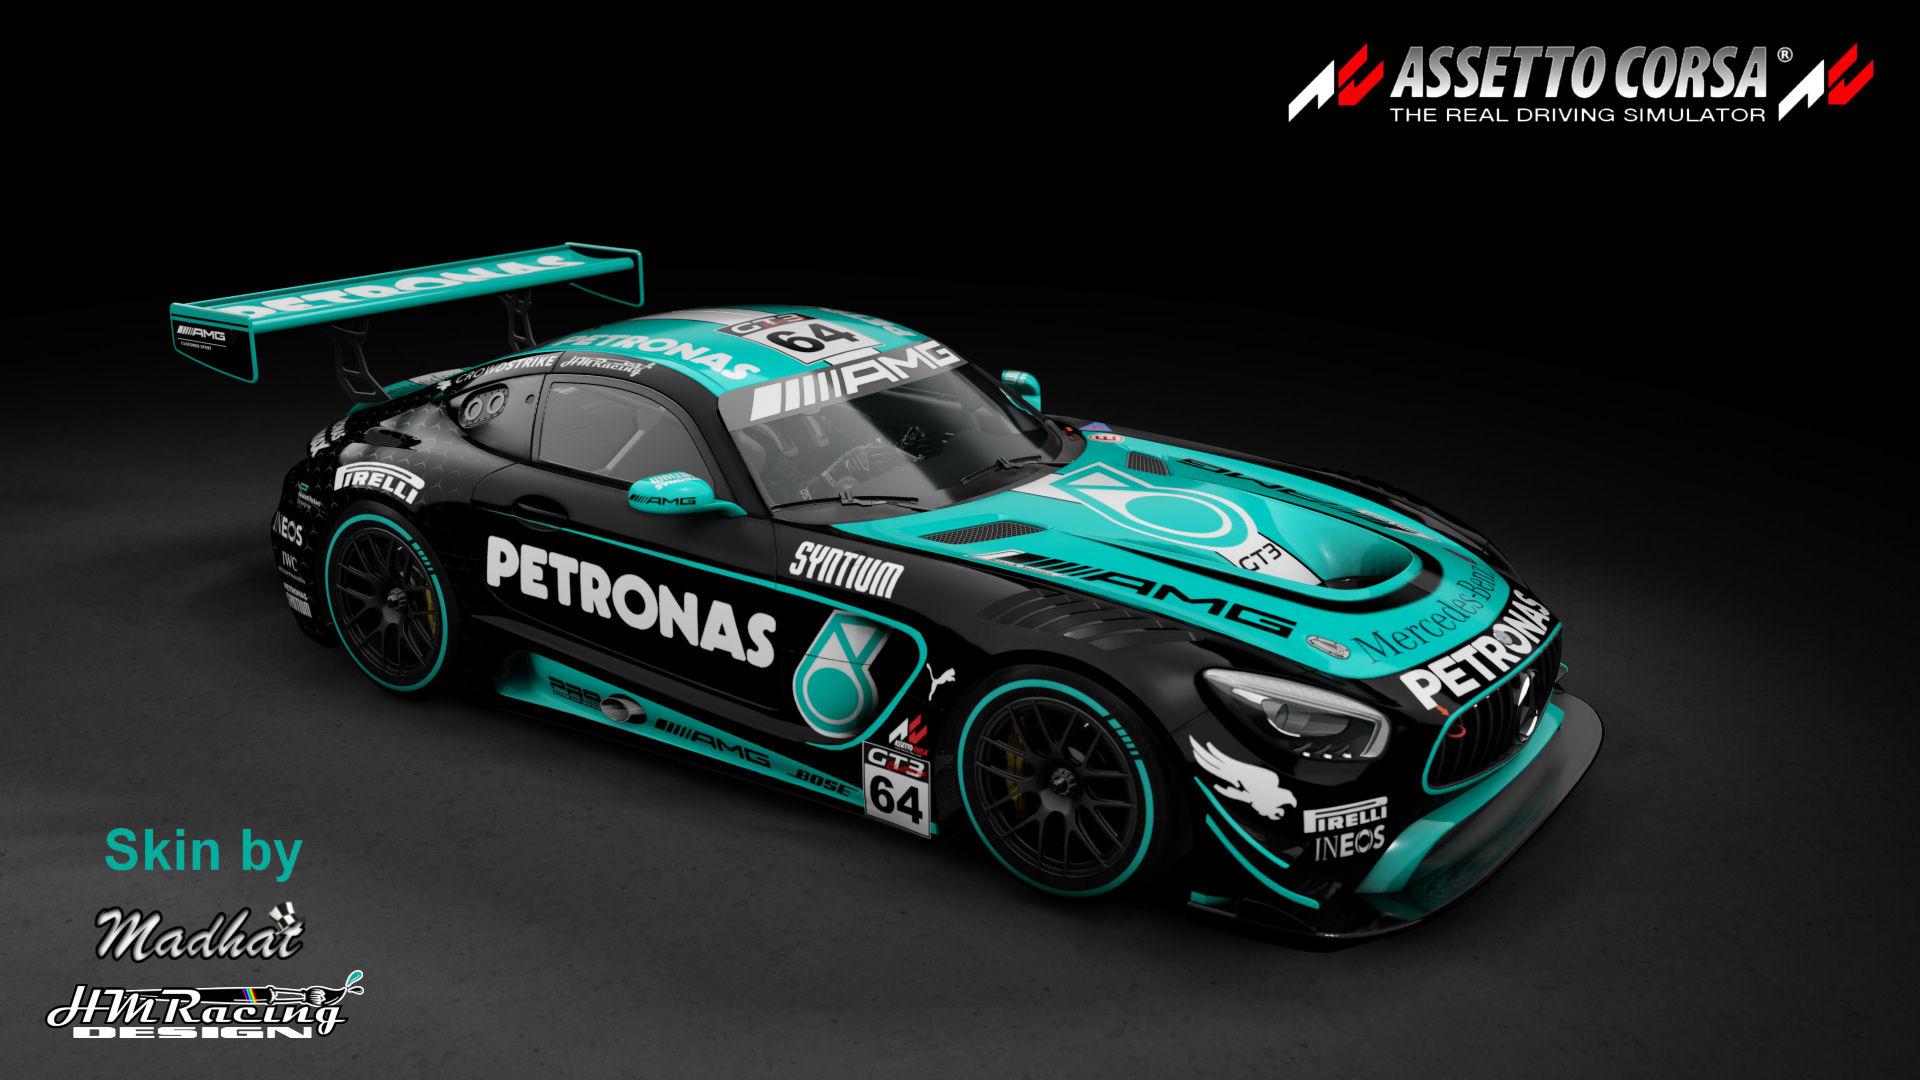 Mercedes AMG GT3 Petronas black 02.jpg